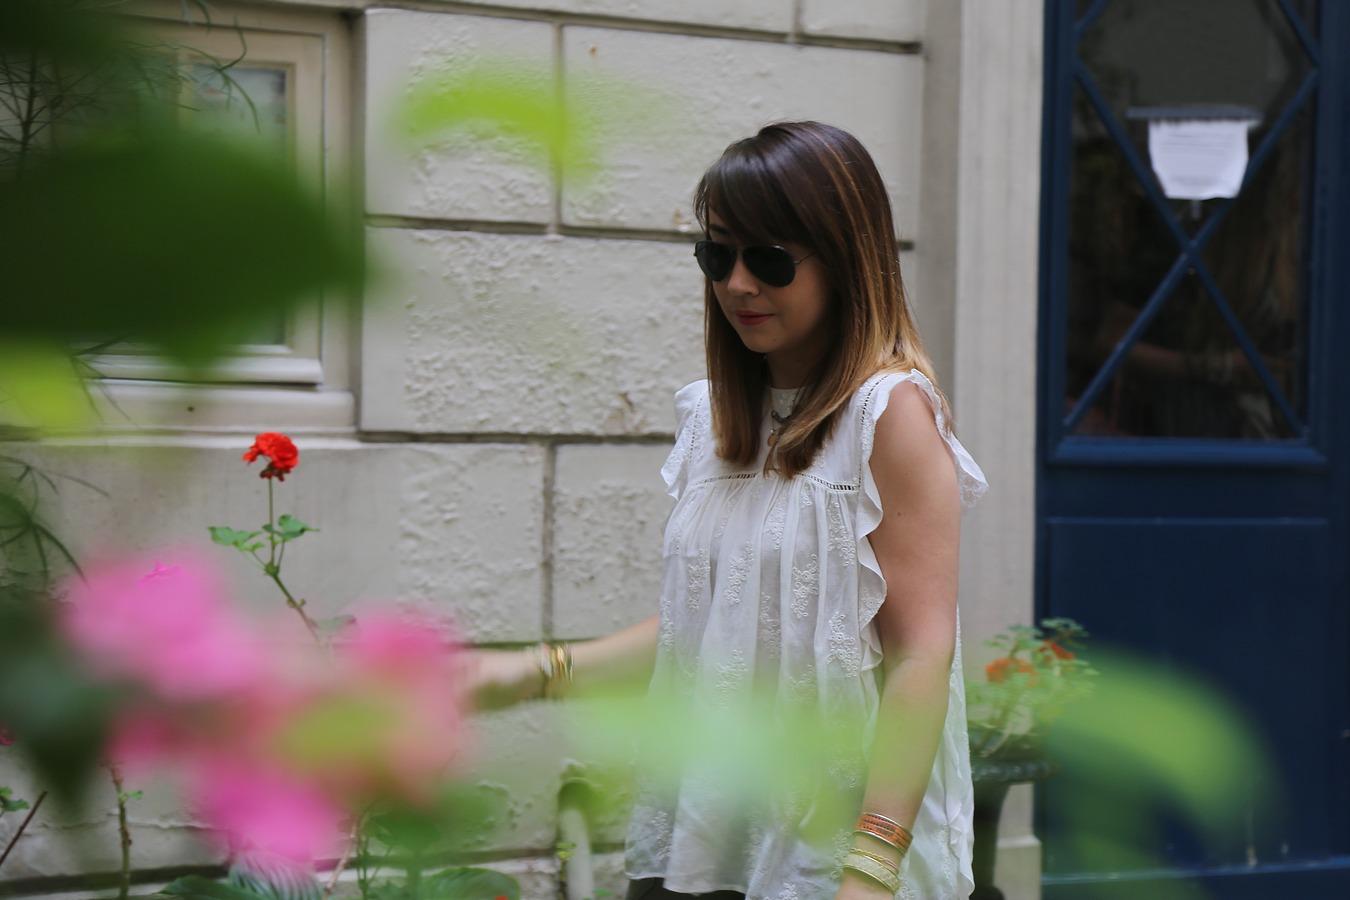 du style madame - blog mode femme - paris - streetstyle - look - kaki - dentelle